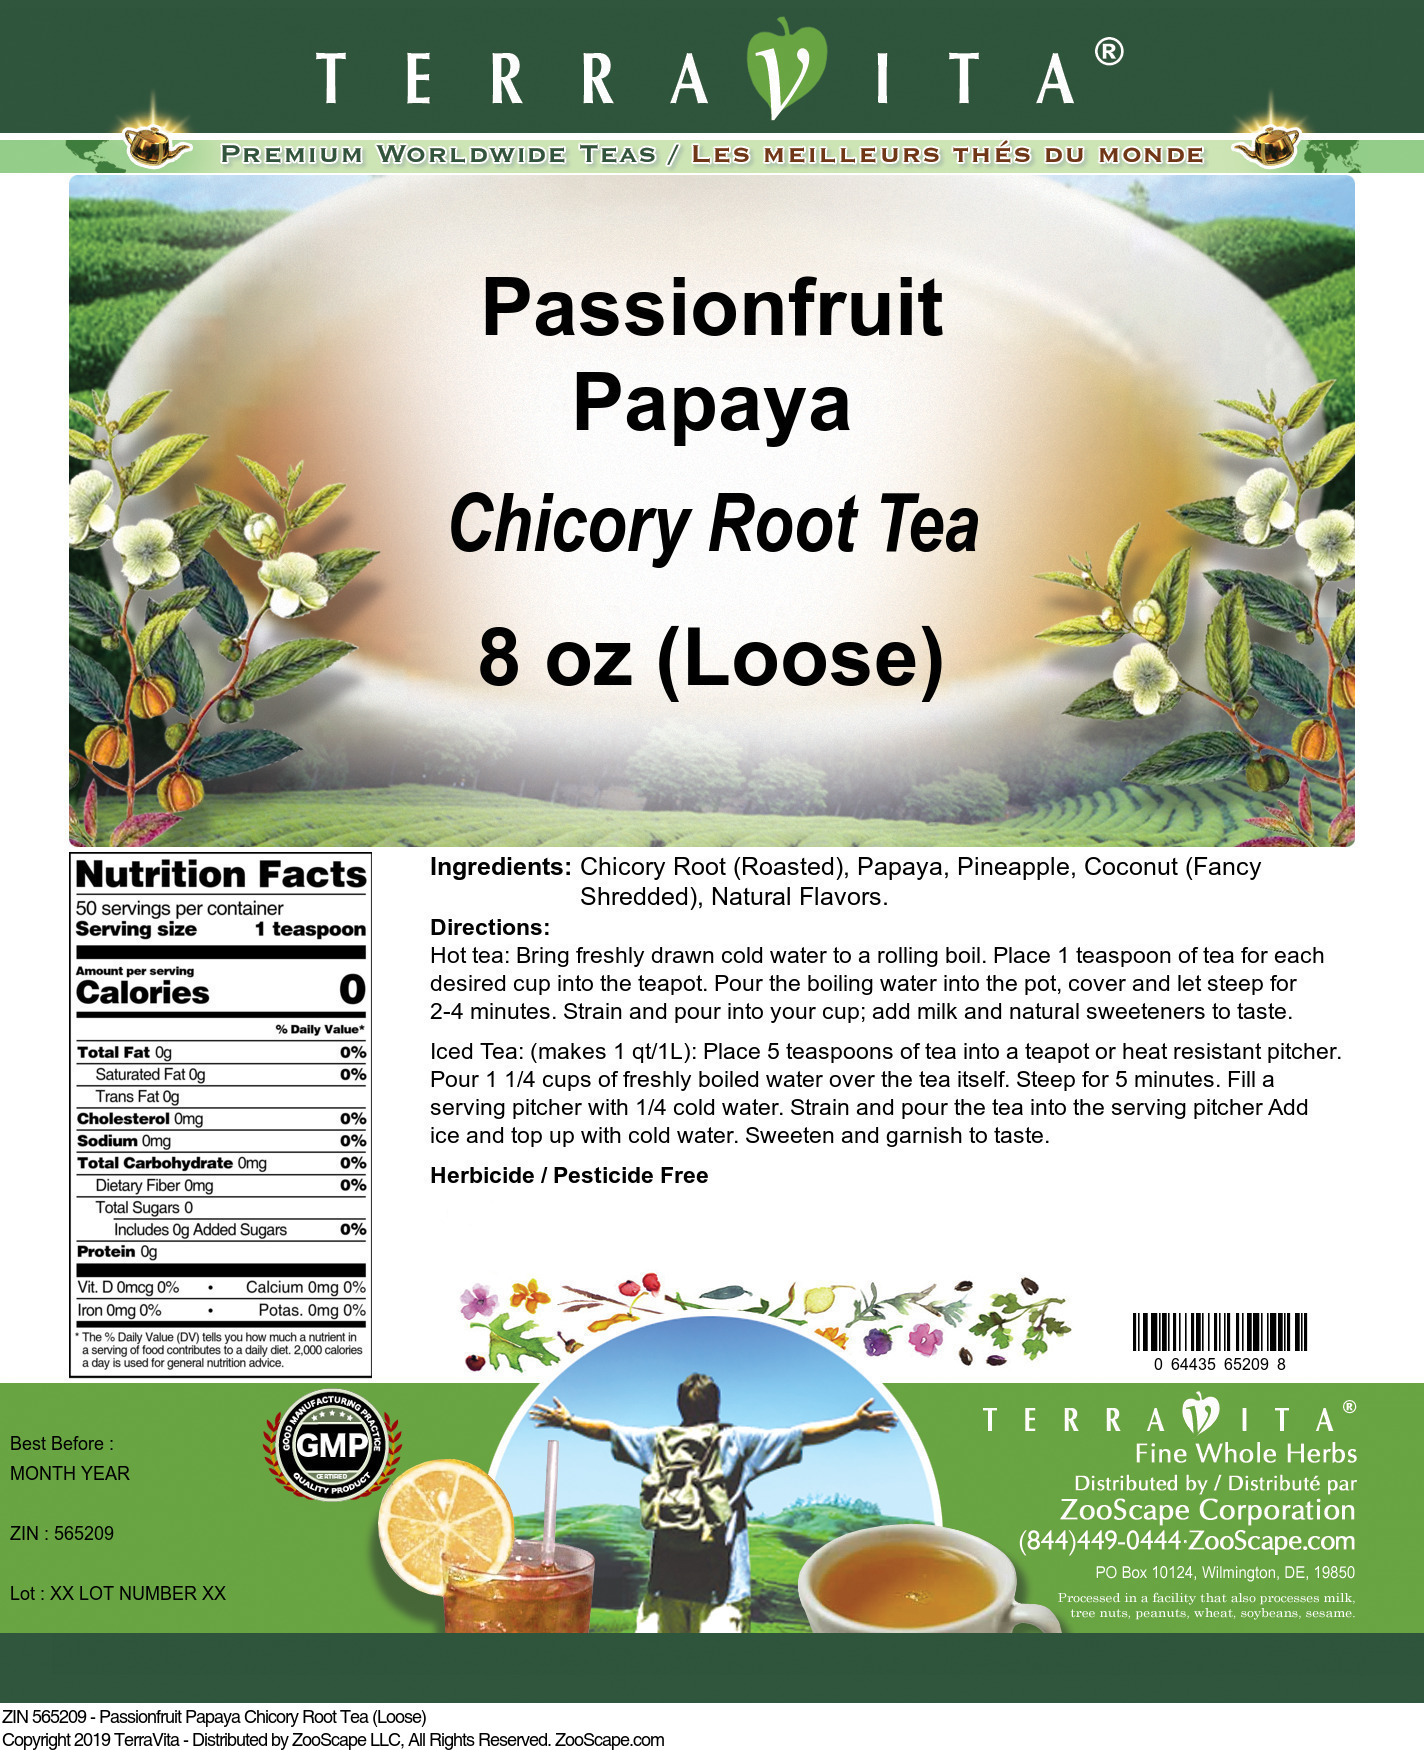 Passionfruit Papaya Chicory Root Tea (Loose)